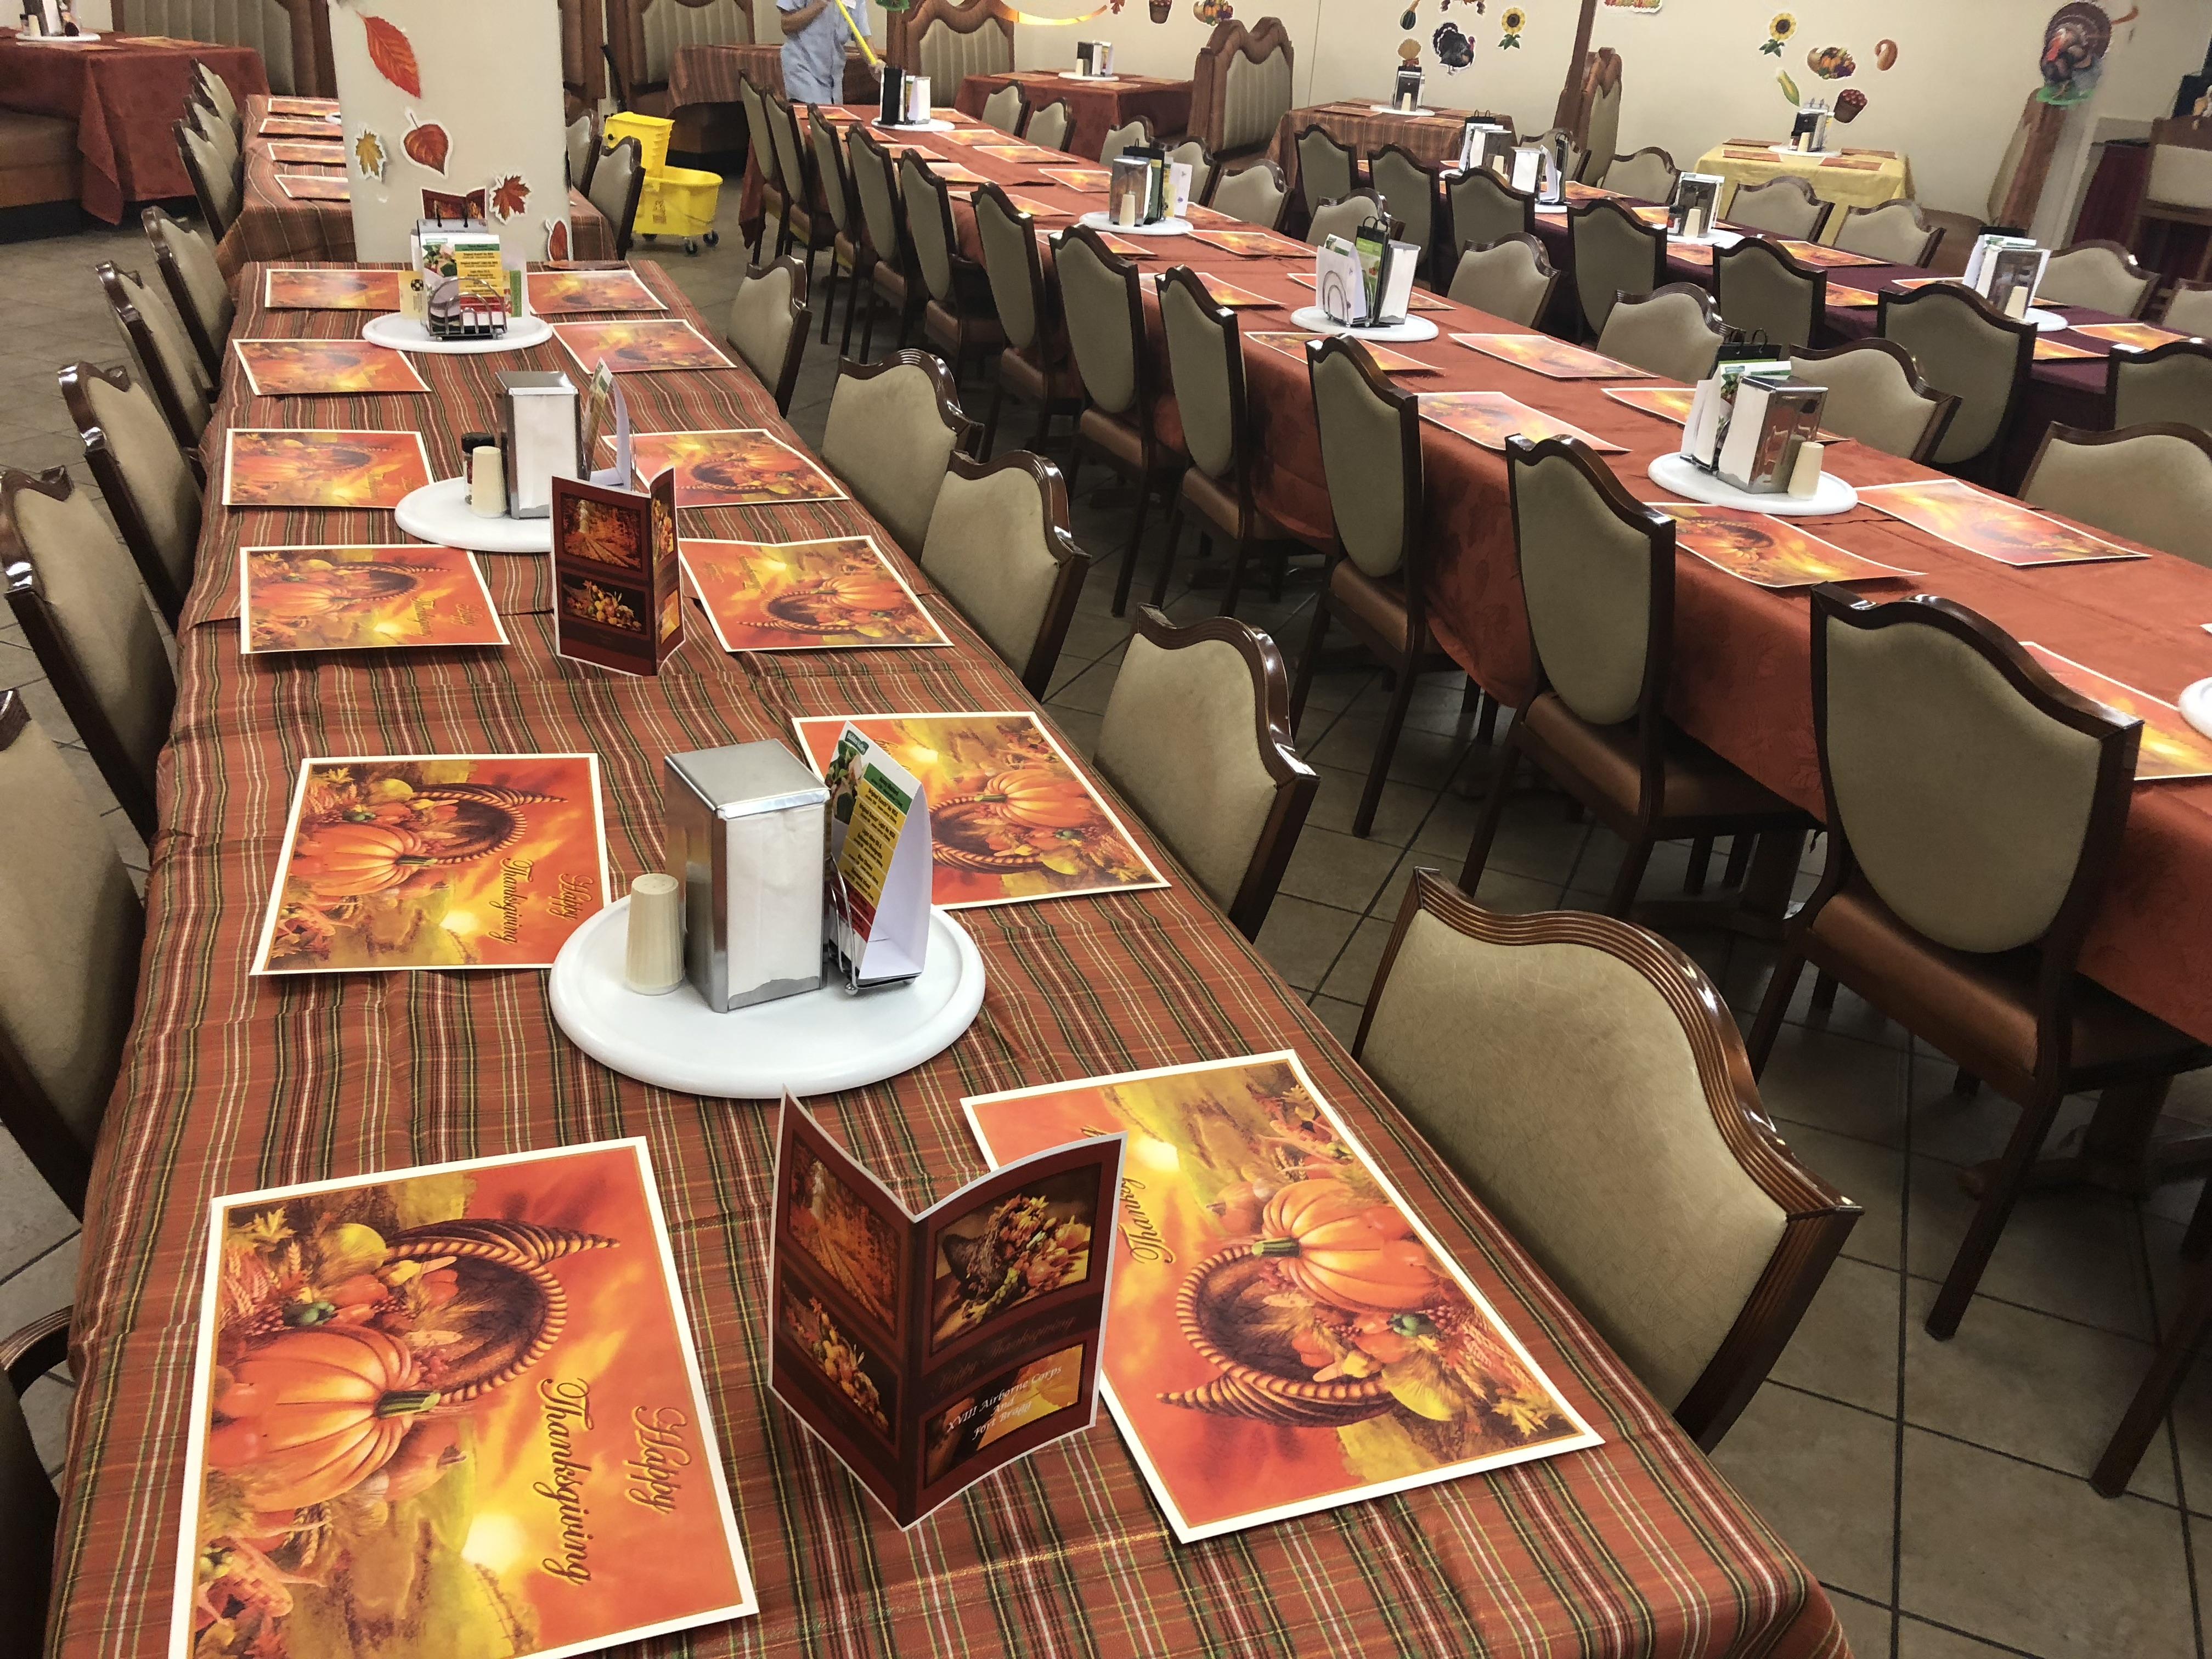 "<div class=""meta image-caption""><div class=""origin-logo origin-image wtvd""><span>WTVD</span></div><span class=""caption-text"">Fort Bragg soldiers prepare for a Thanksgiving feast. (Akilah Davis)</span></div>"